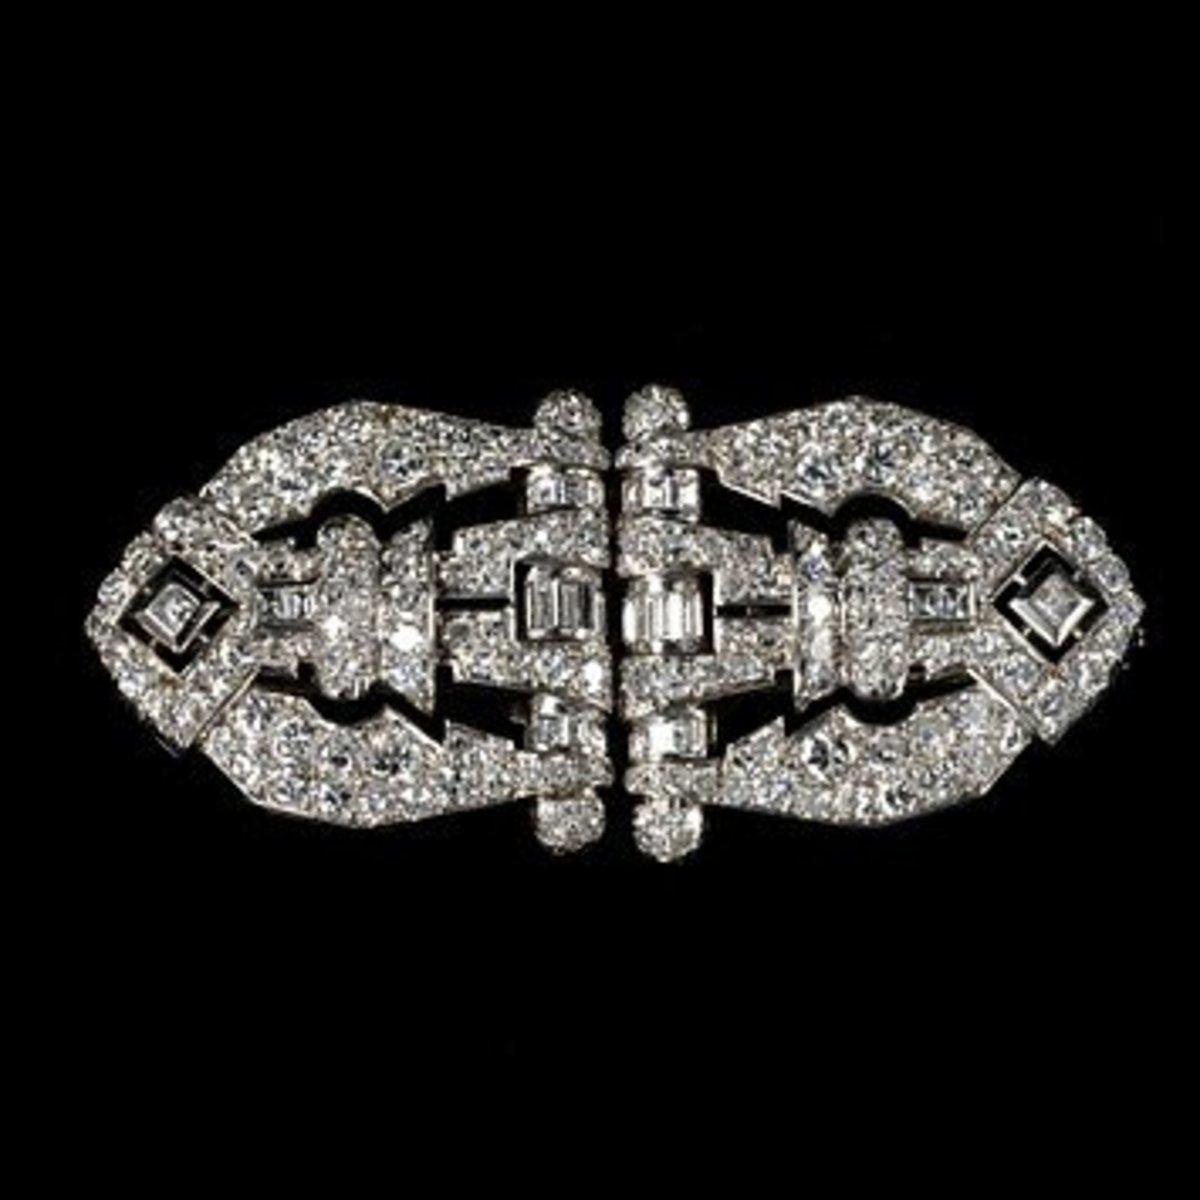 Art Deco diamond and platinum brooch.